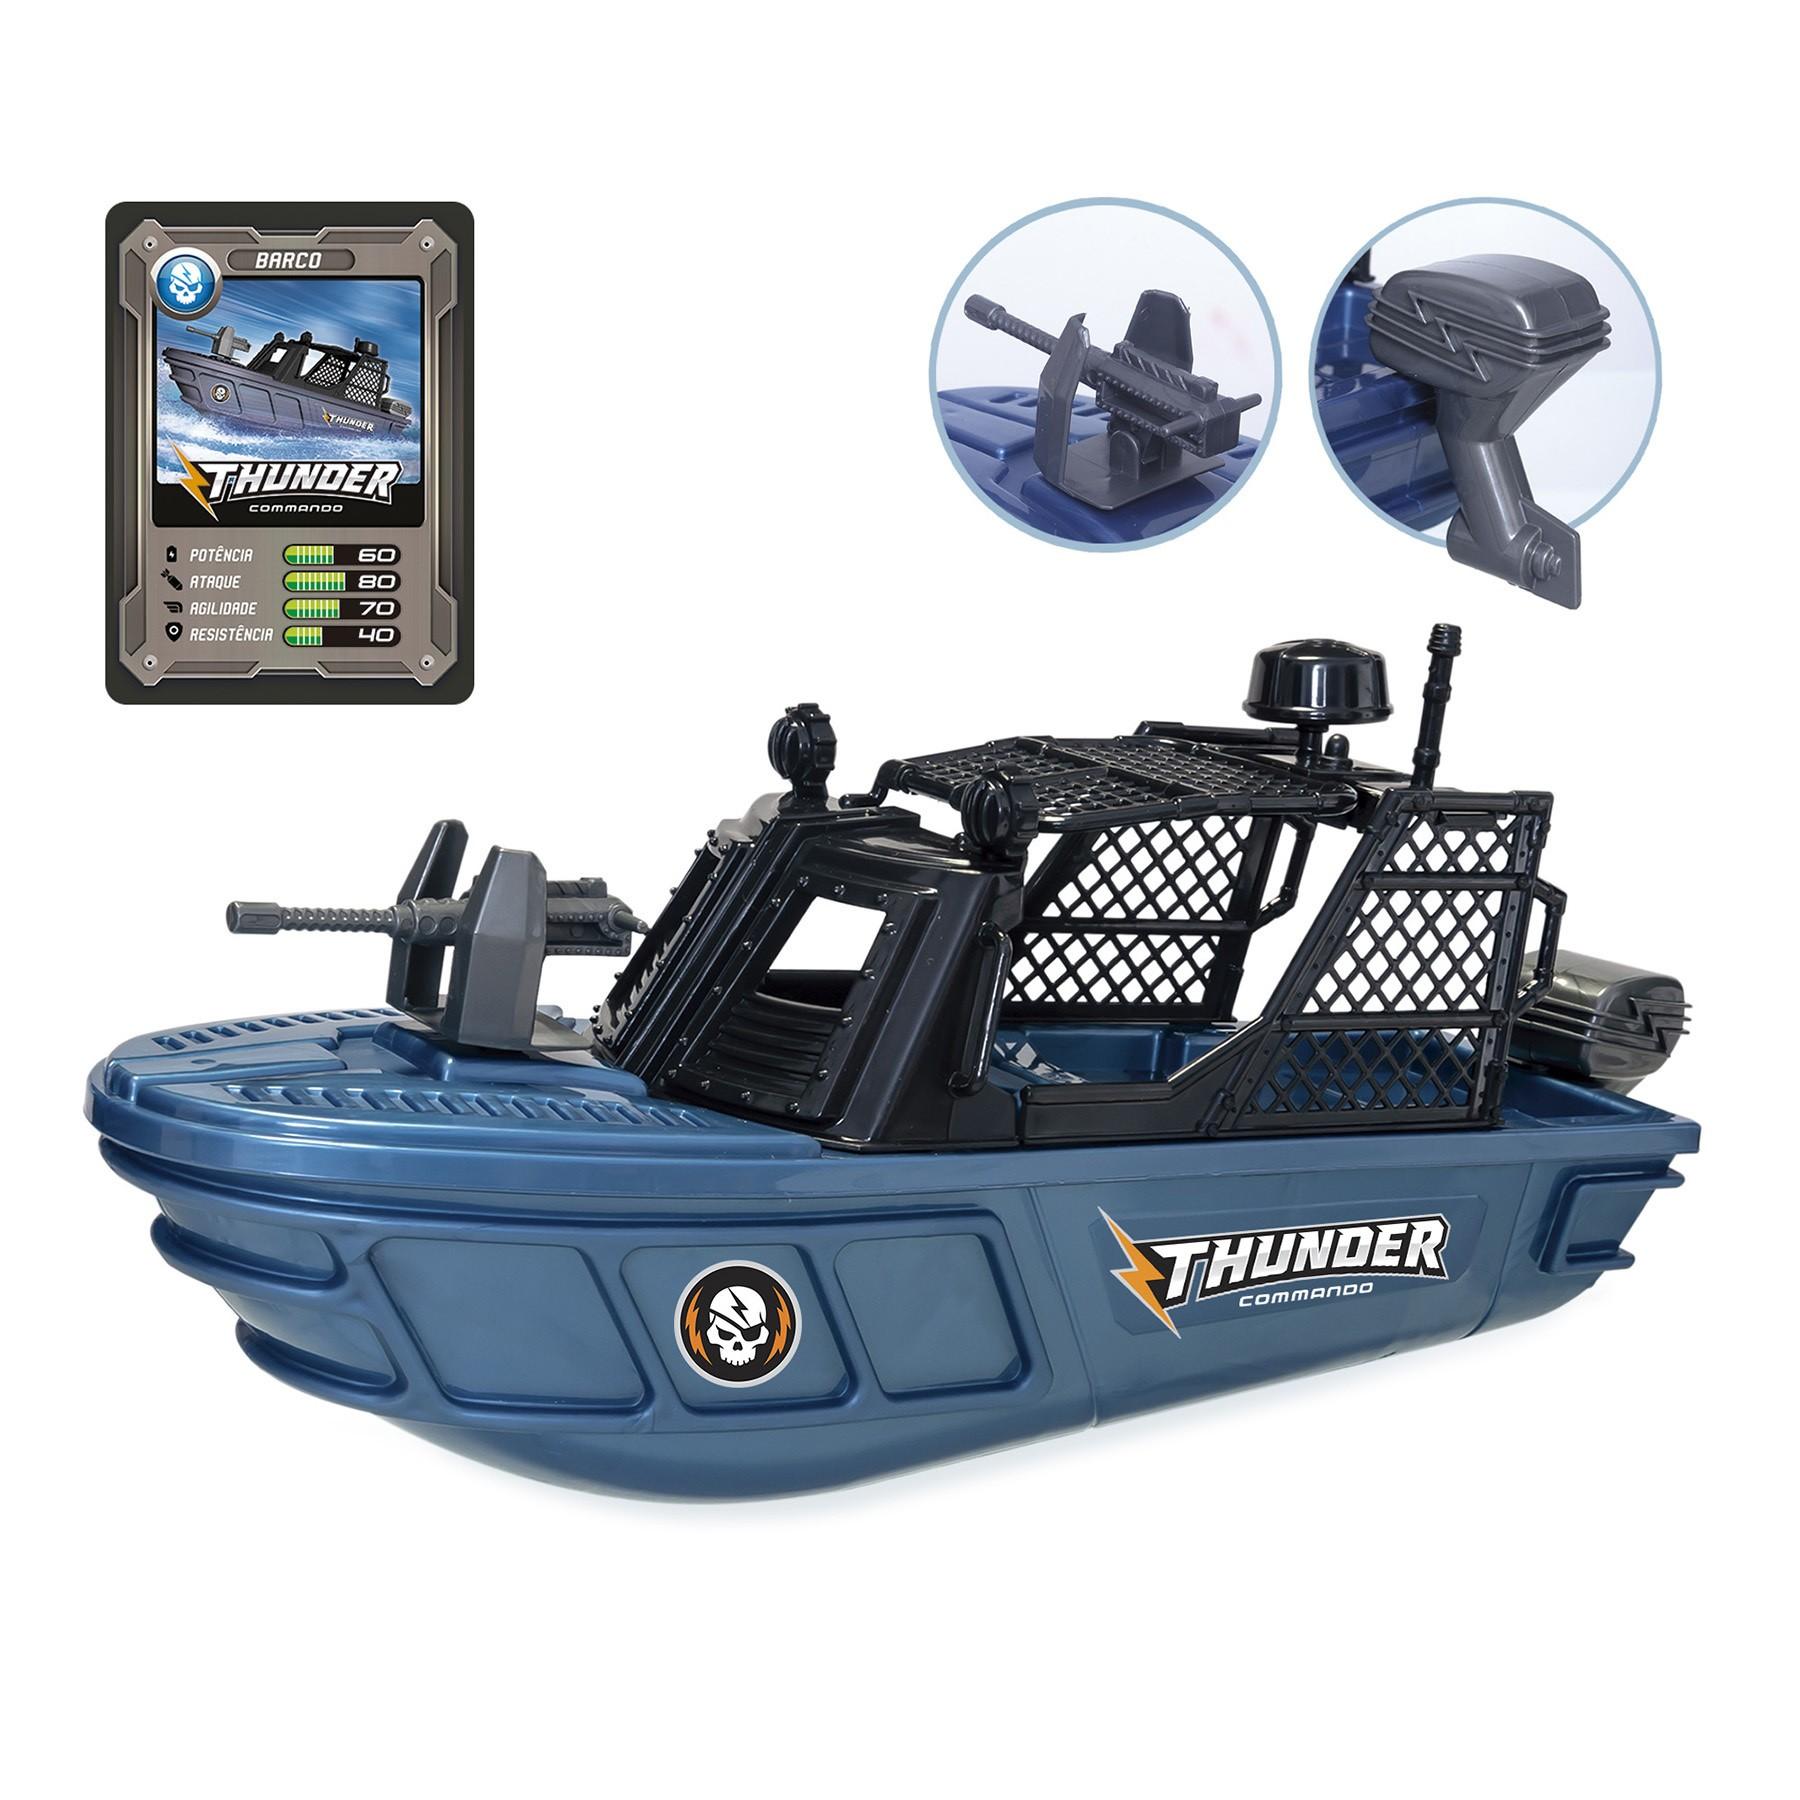 Brinquedo Barco Thunder Comando - Usual Brinquedos